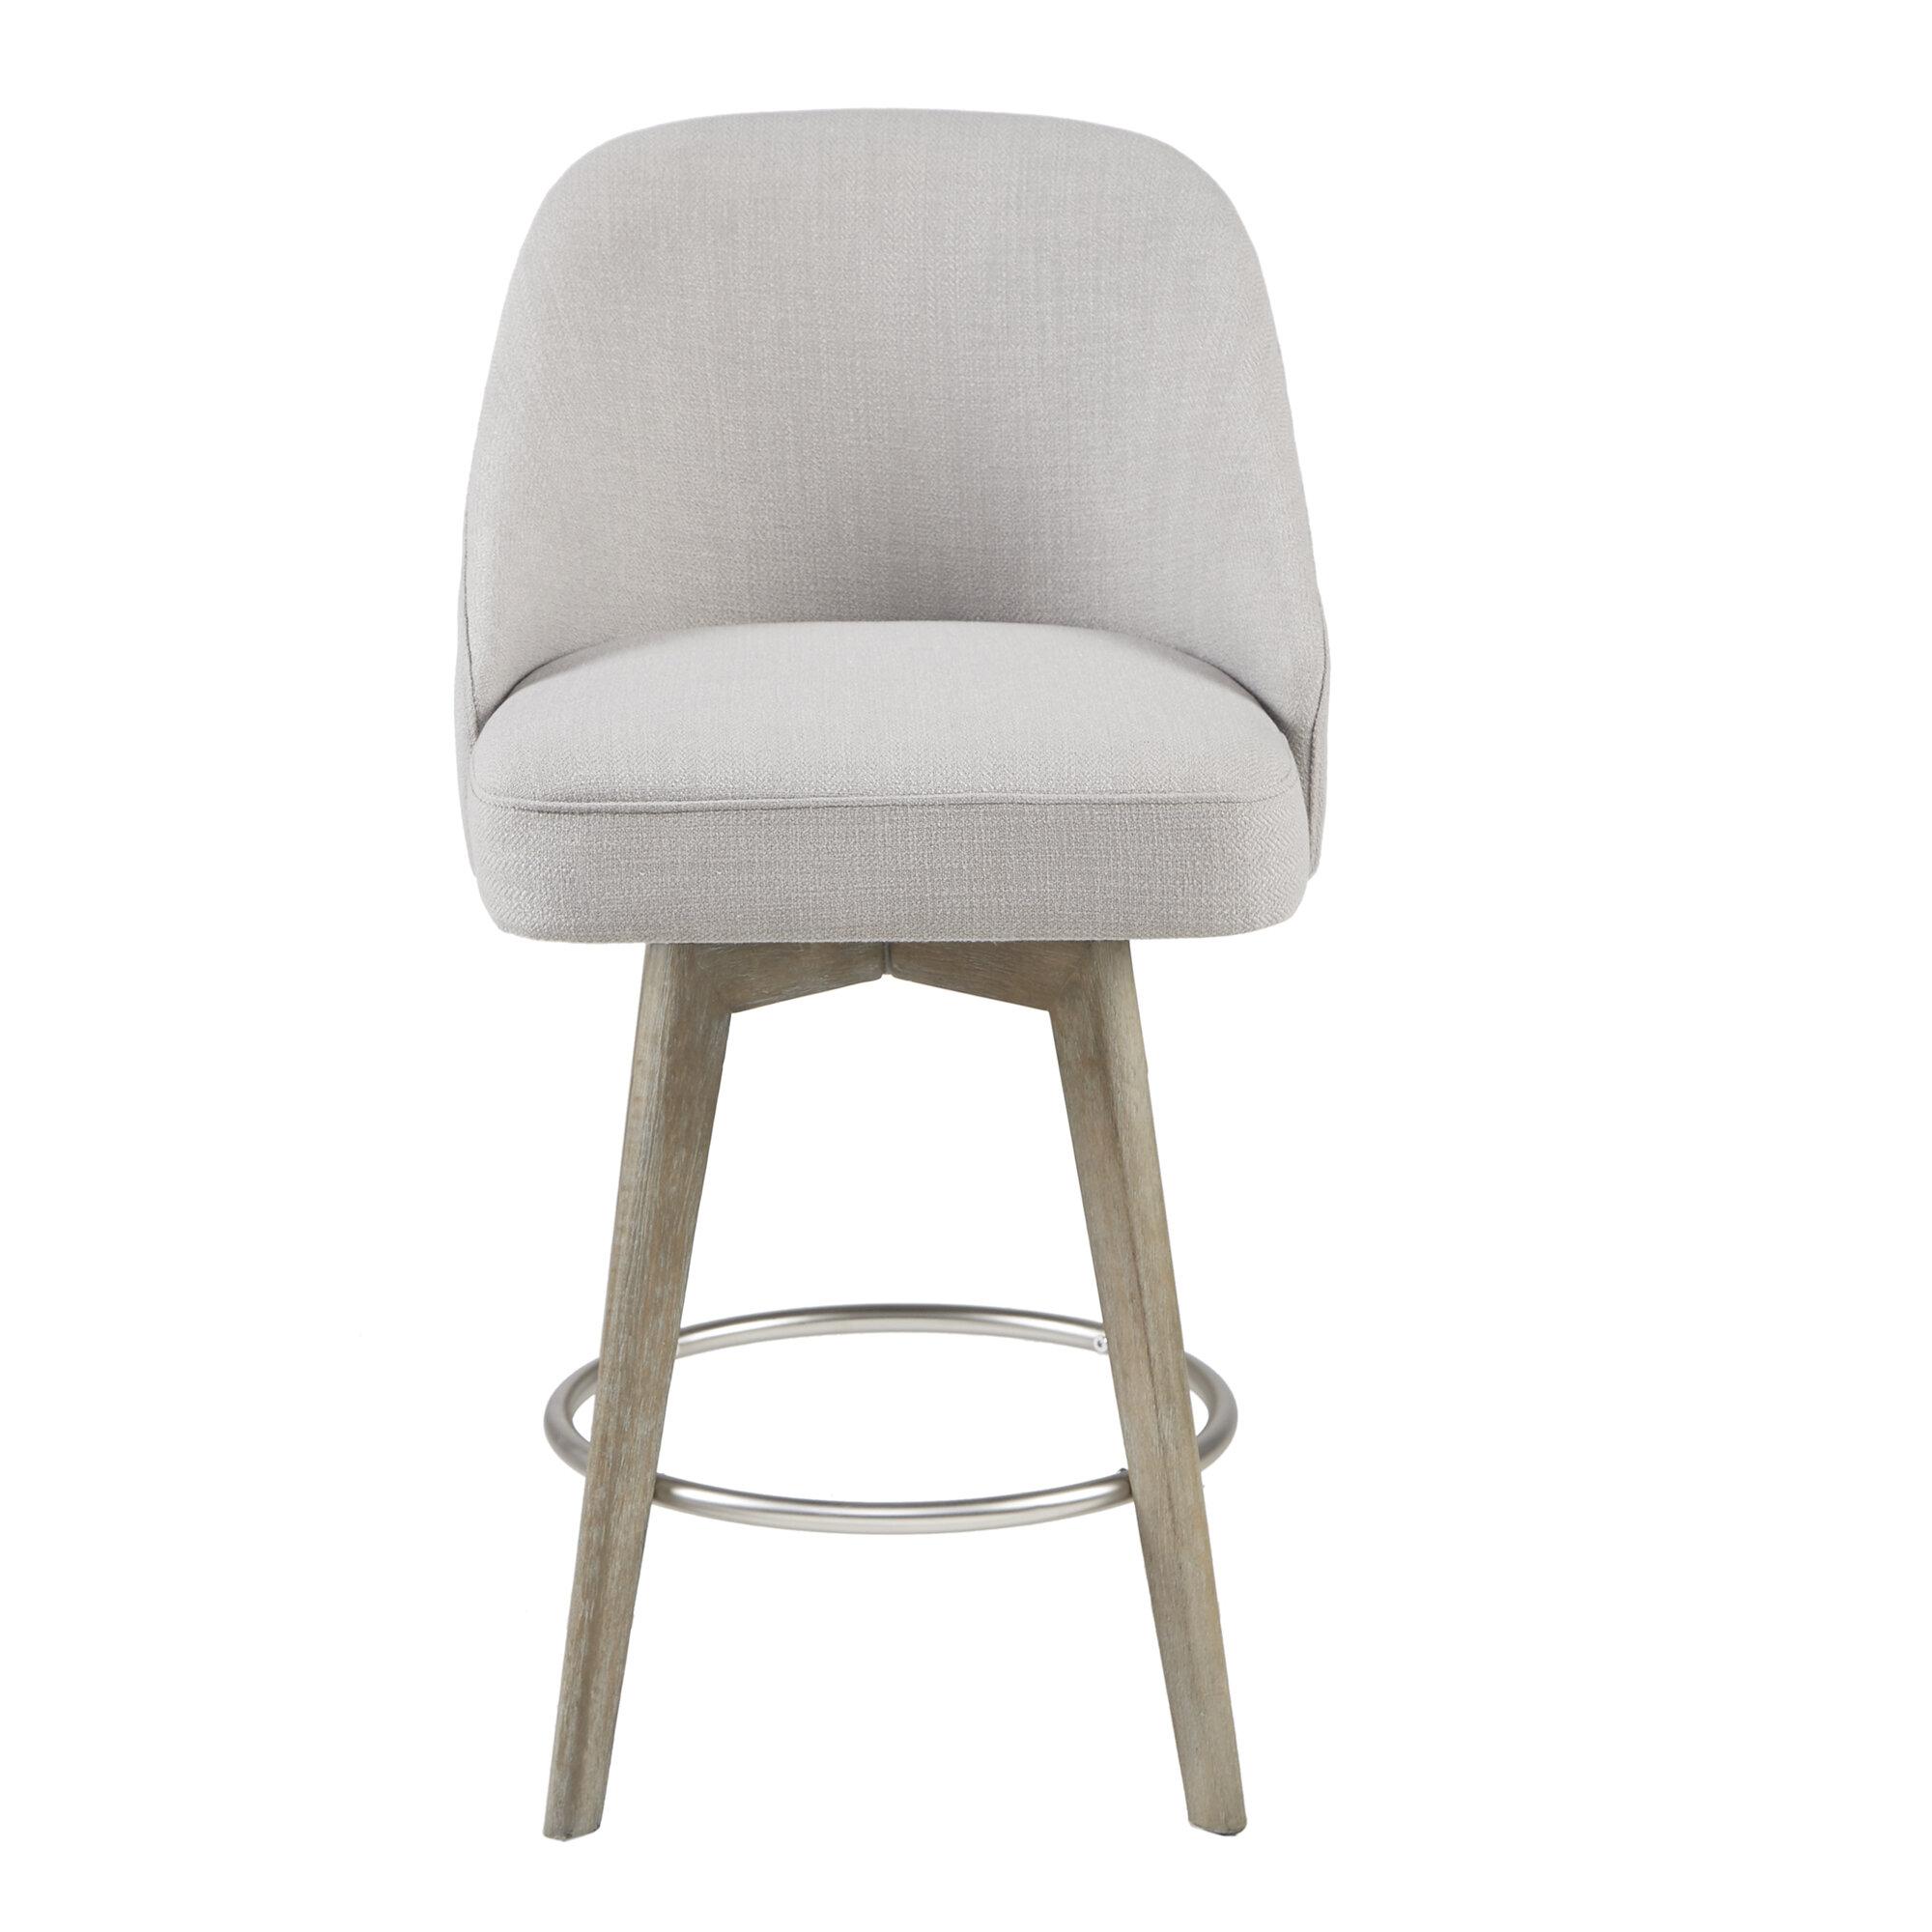 Astonishing Lermitage 25 75 Swivel Counter Stool Lamtechconsult Wood Chair Design Ideas Lamtechconsultcom